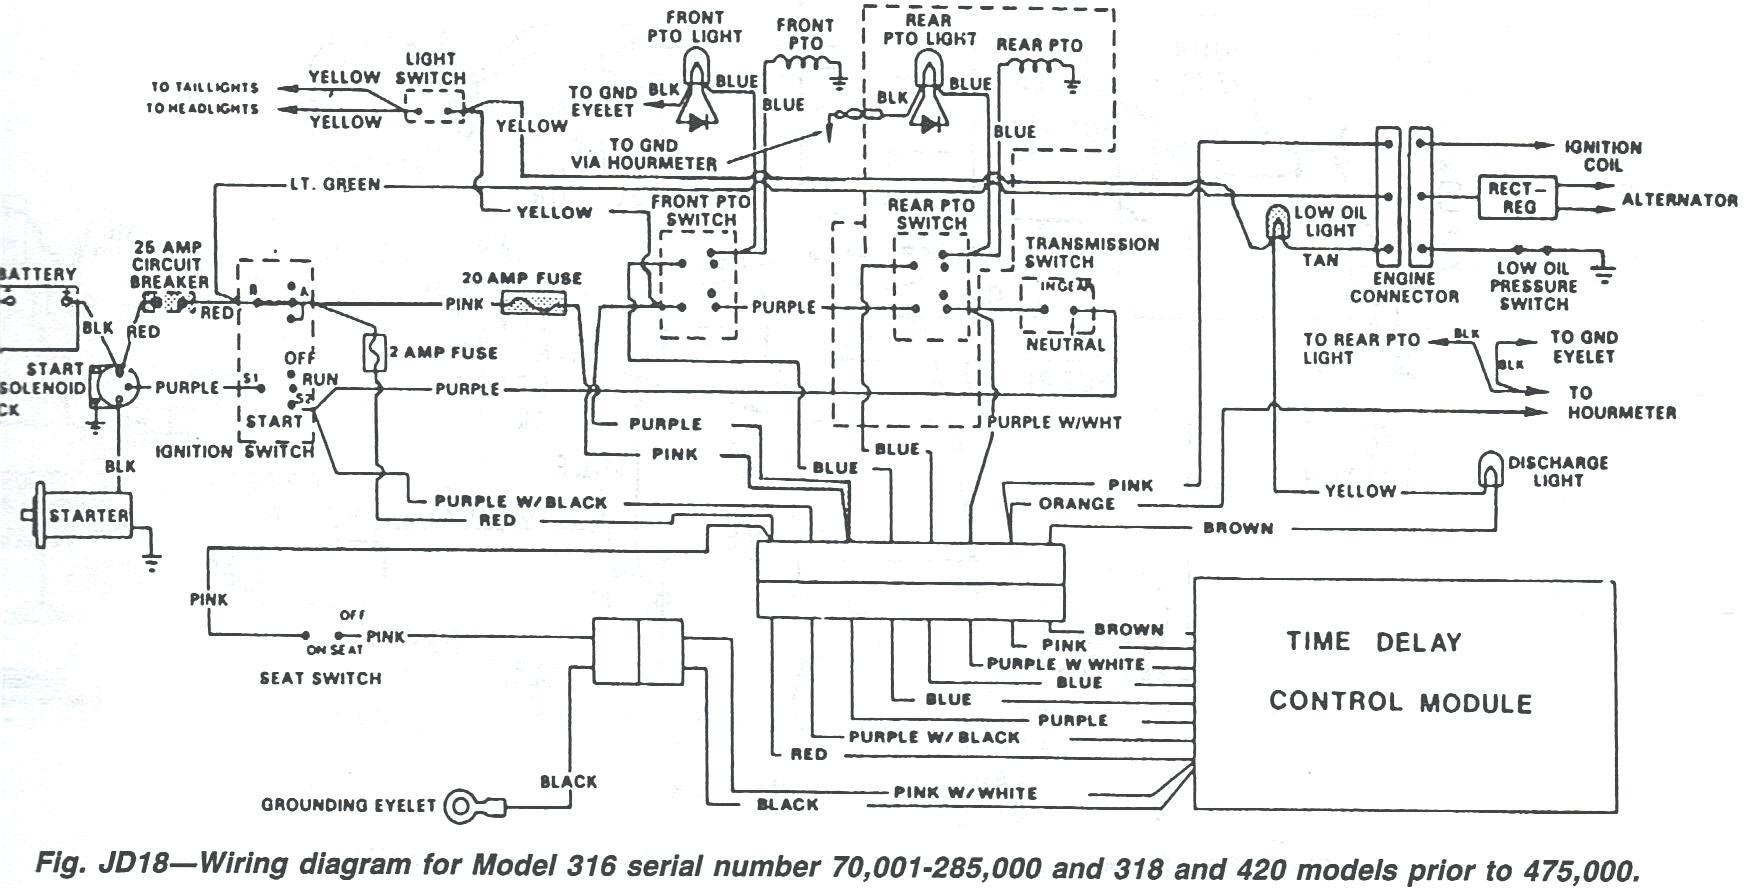 MS_3467] John Deere 322 Wiring Harness Free Diagram